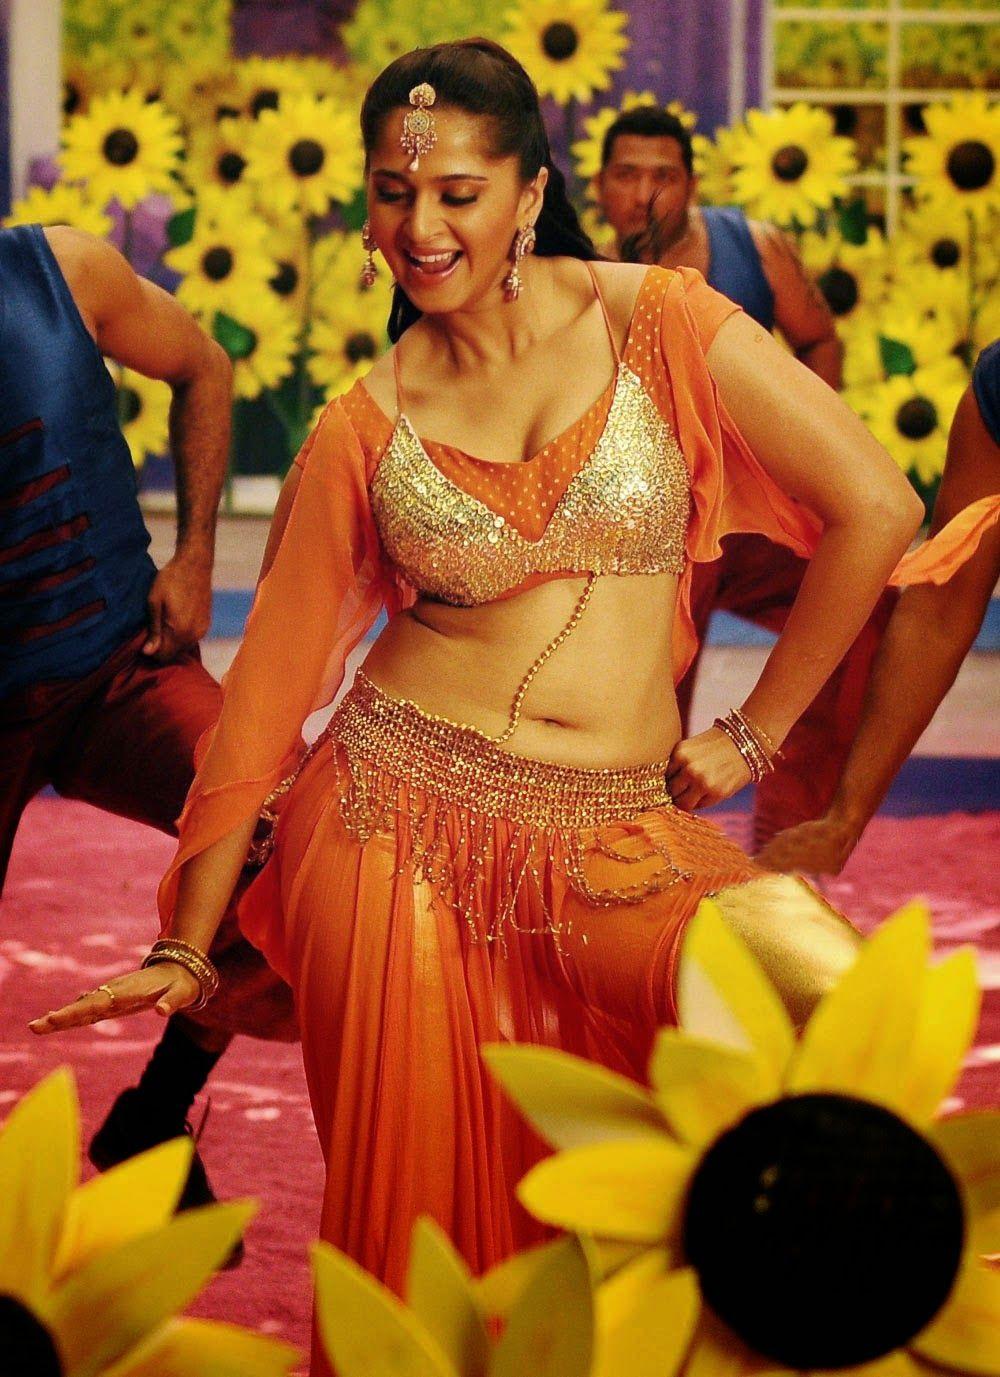 Anushka shetty anushka shetty hot stills pictures beautiful pictures - Anushka Shetty Anushka Shetty Hot Stills Pictures Beautiful Pictures 37